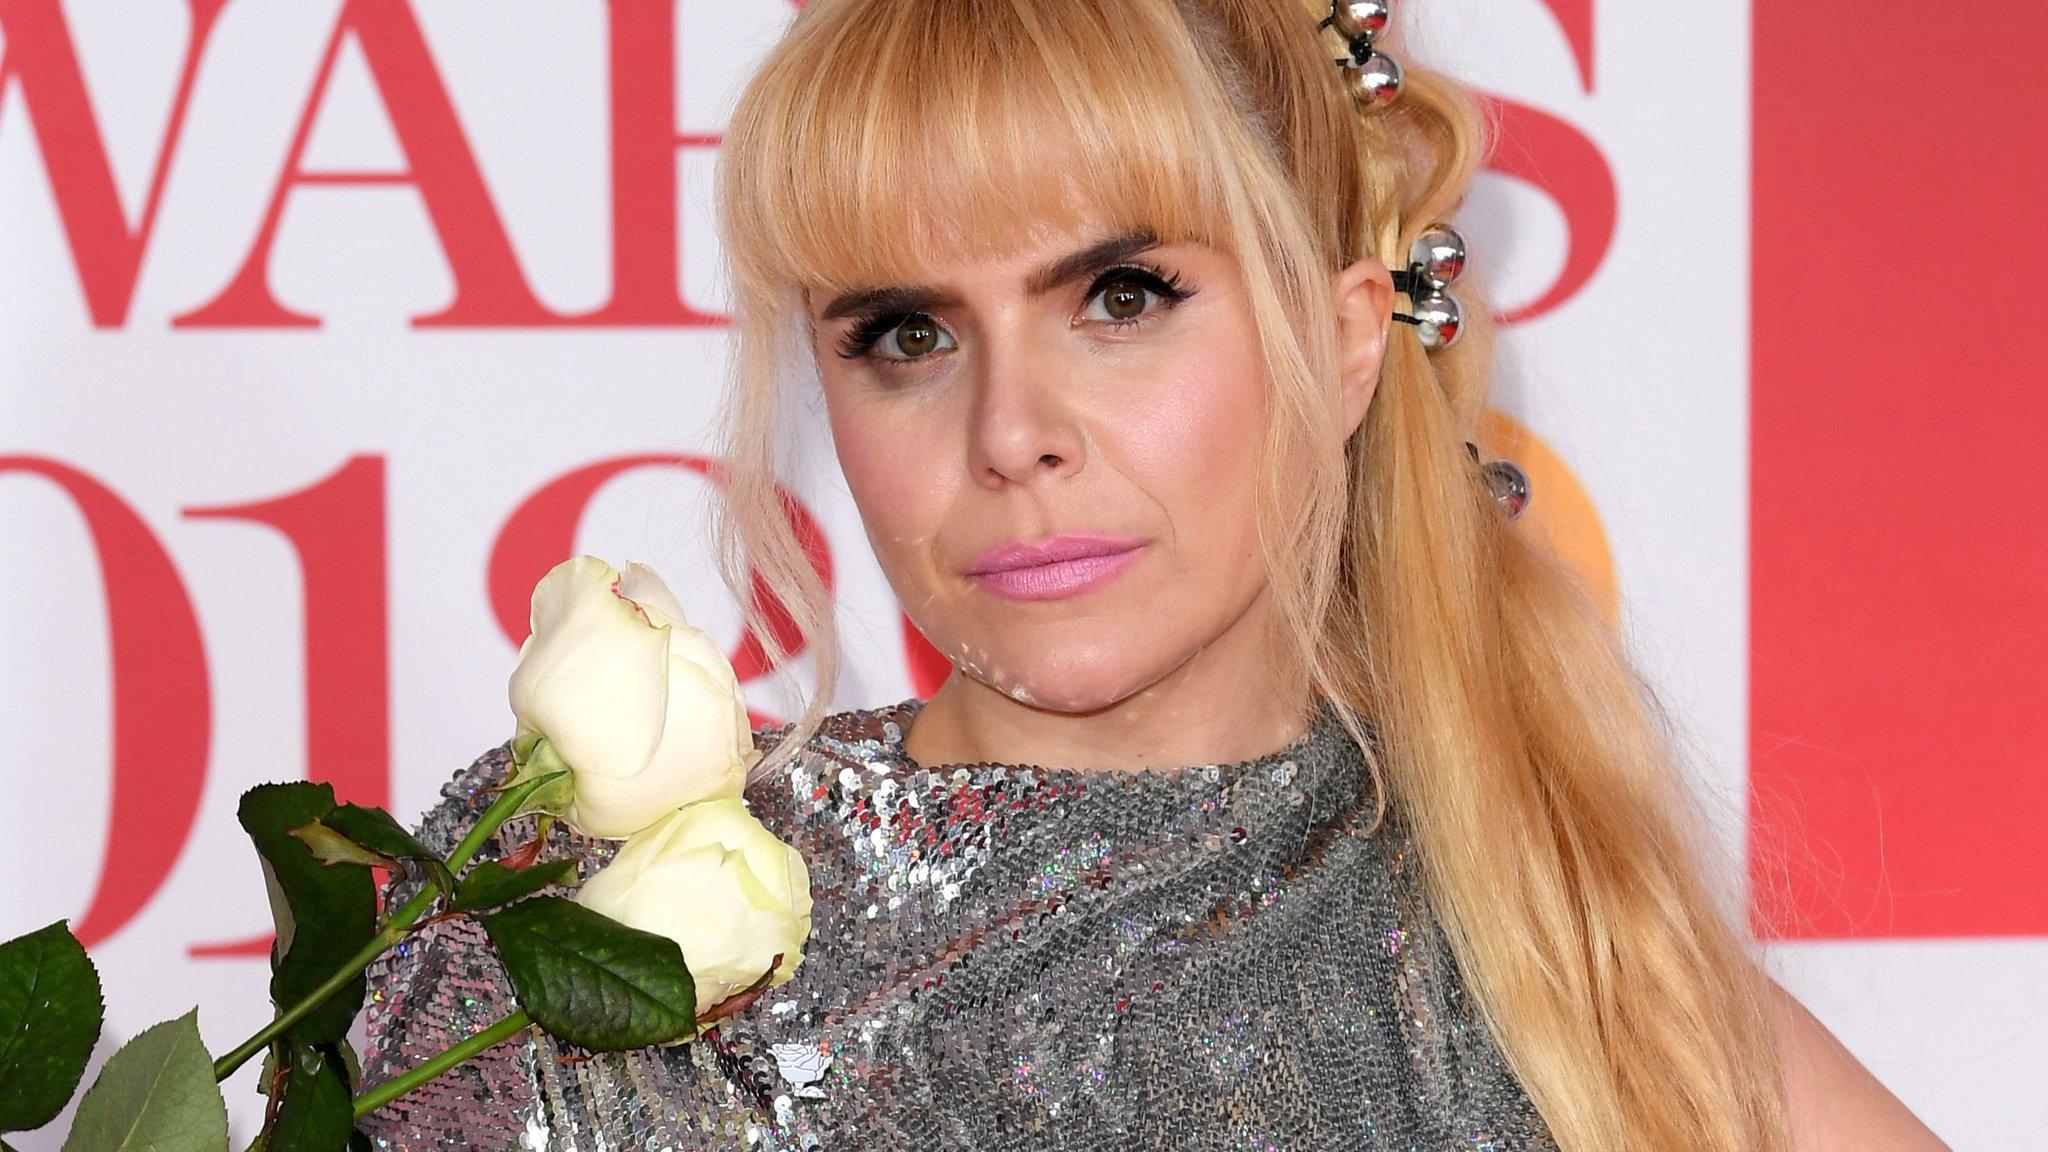 BBC News - Brit Awards 2018: White roses on the red carpet, but Paloma Faith's upset